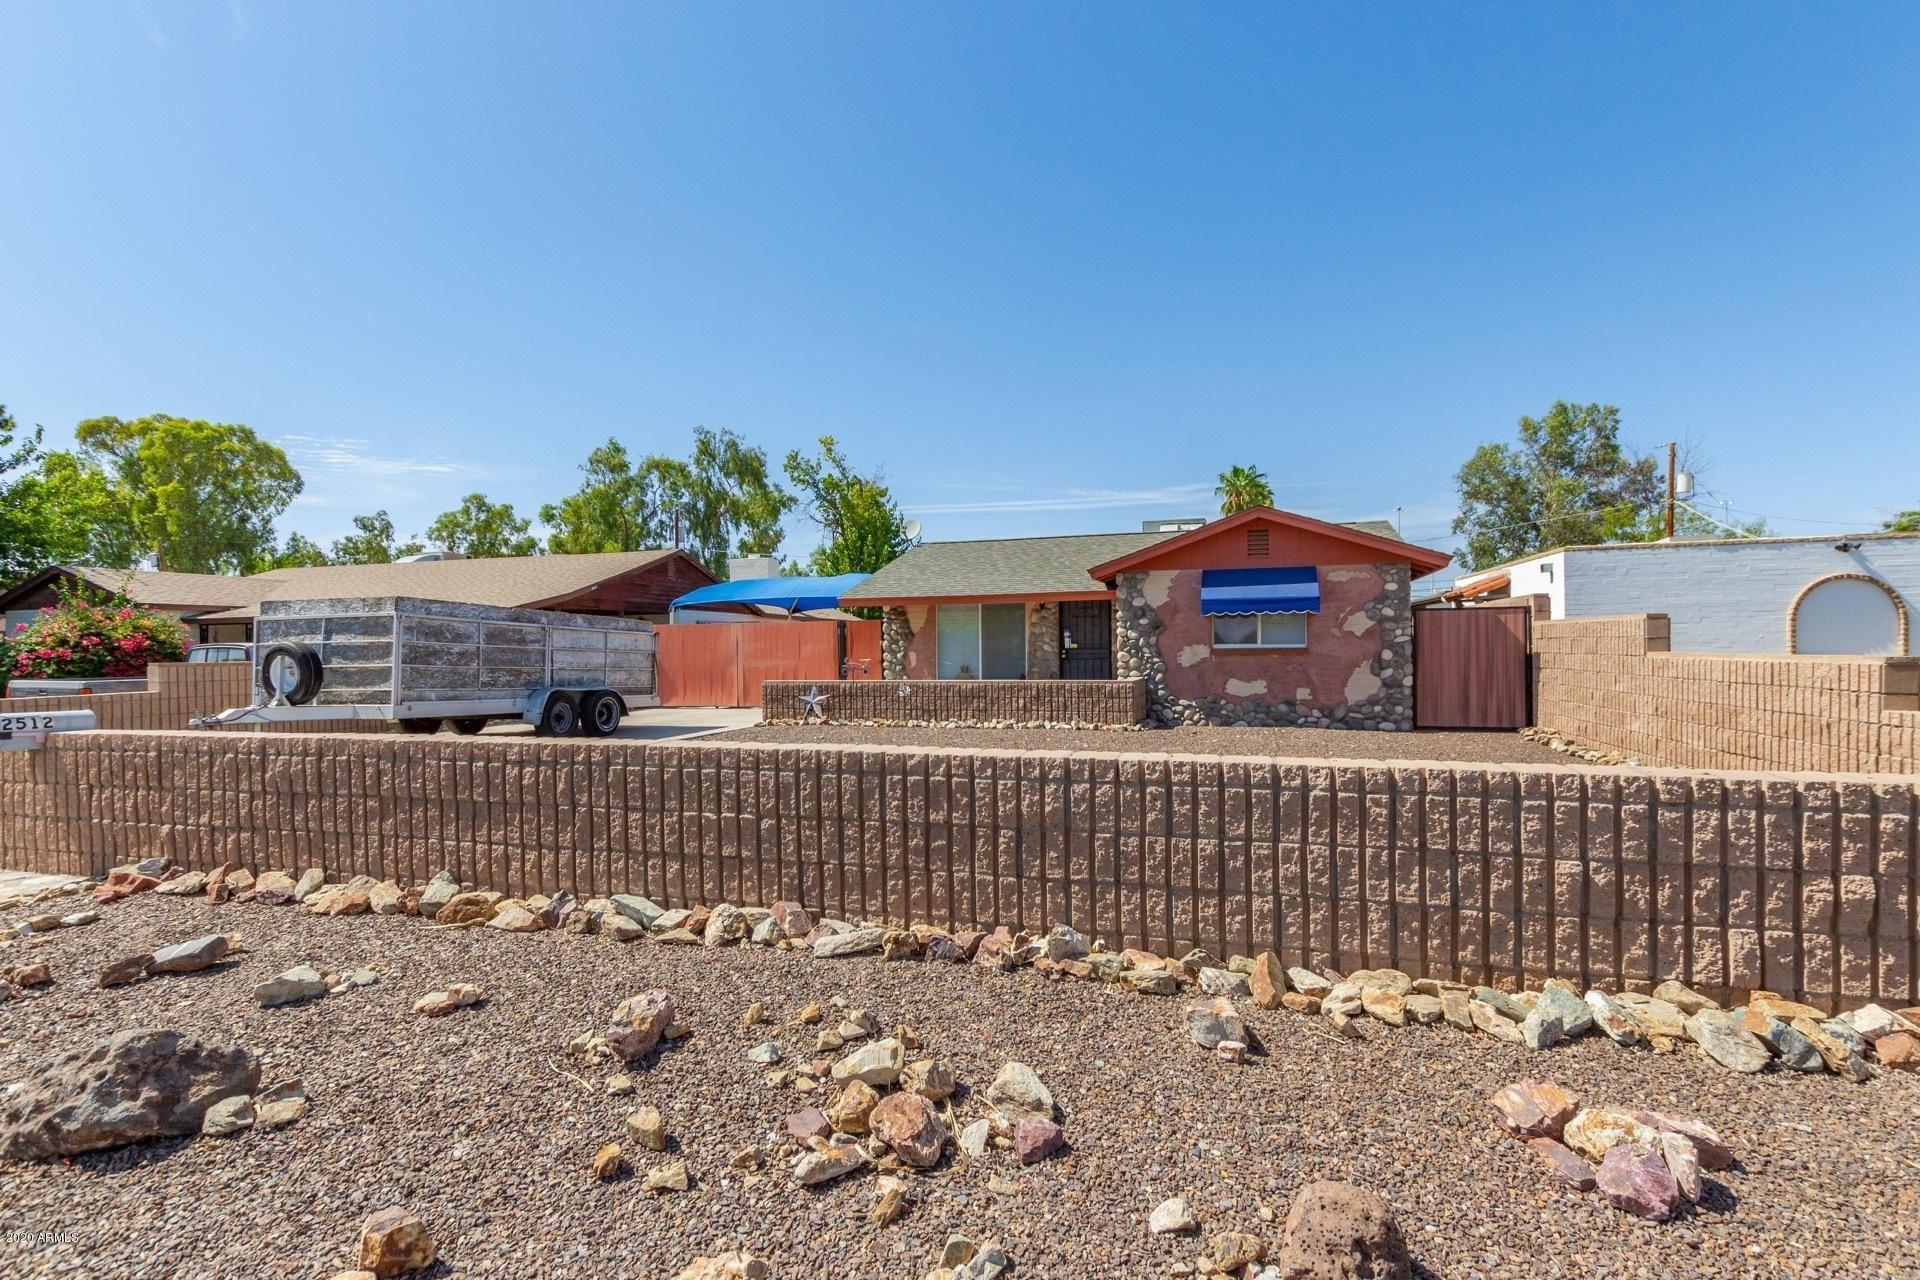 2512 W BELMONT Avenue, Phoenix, AZ 85051 - MLS#: 6098012